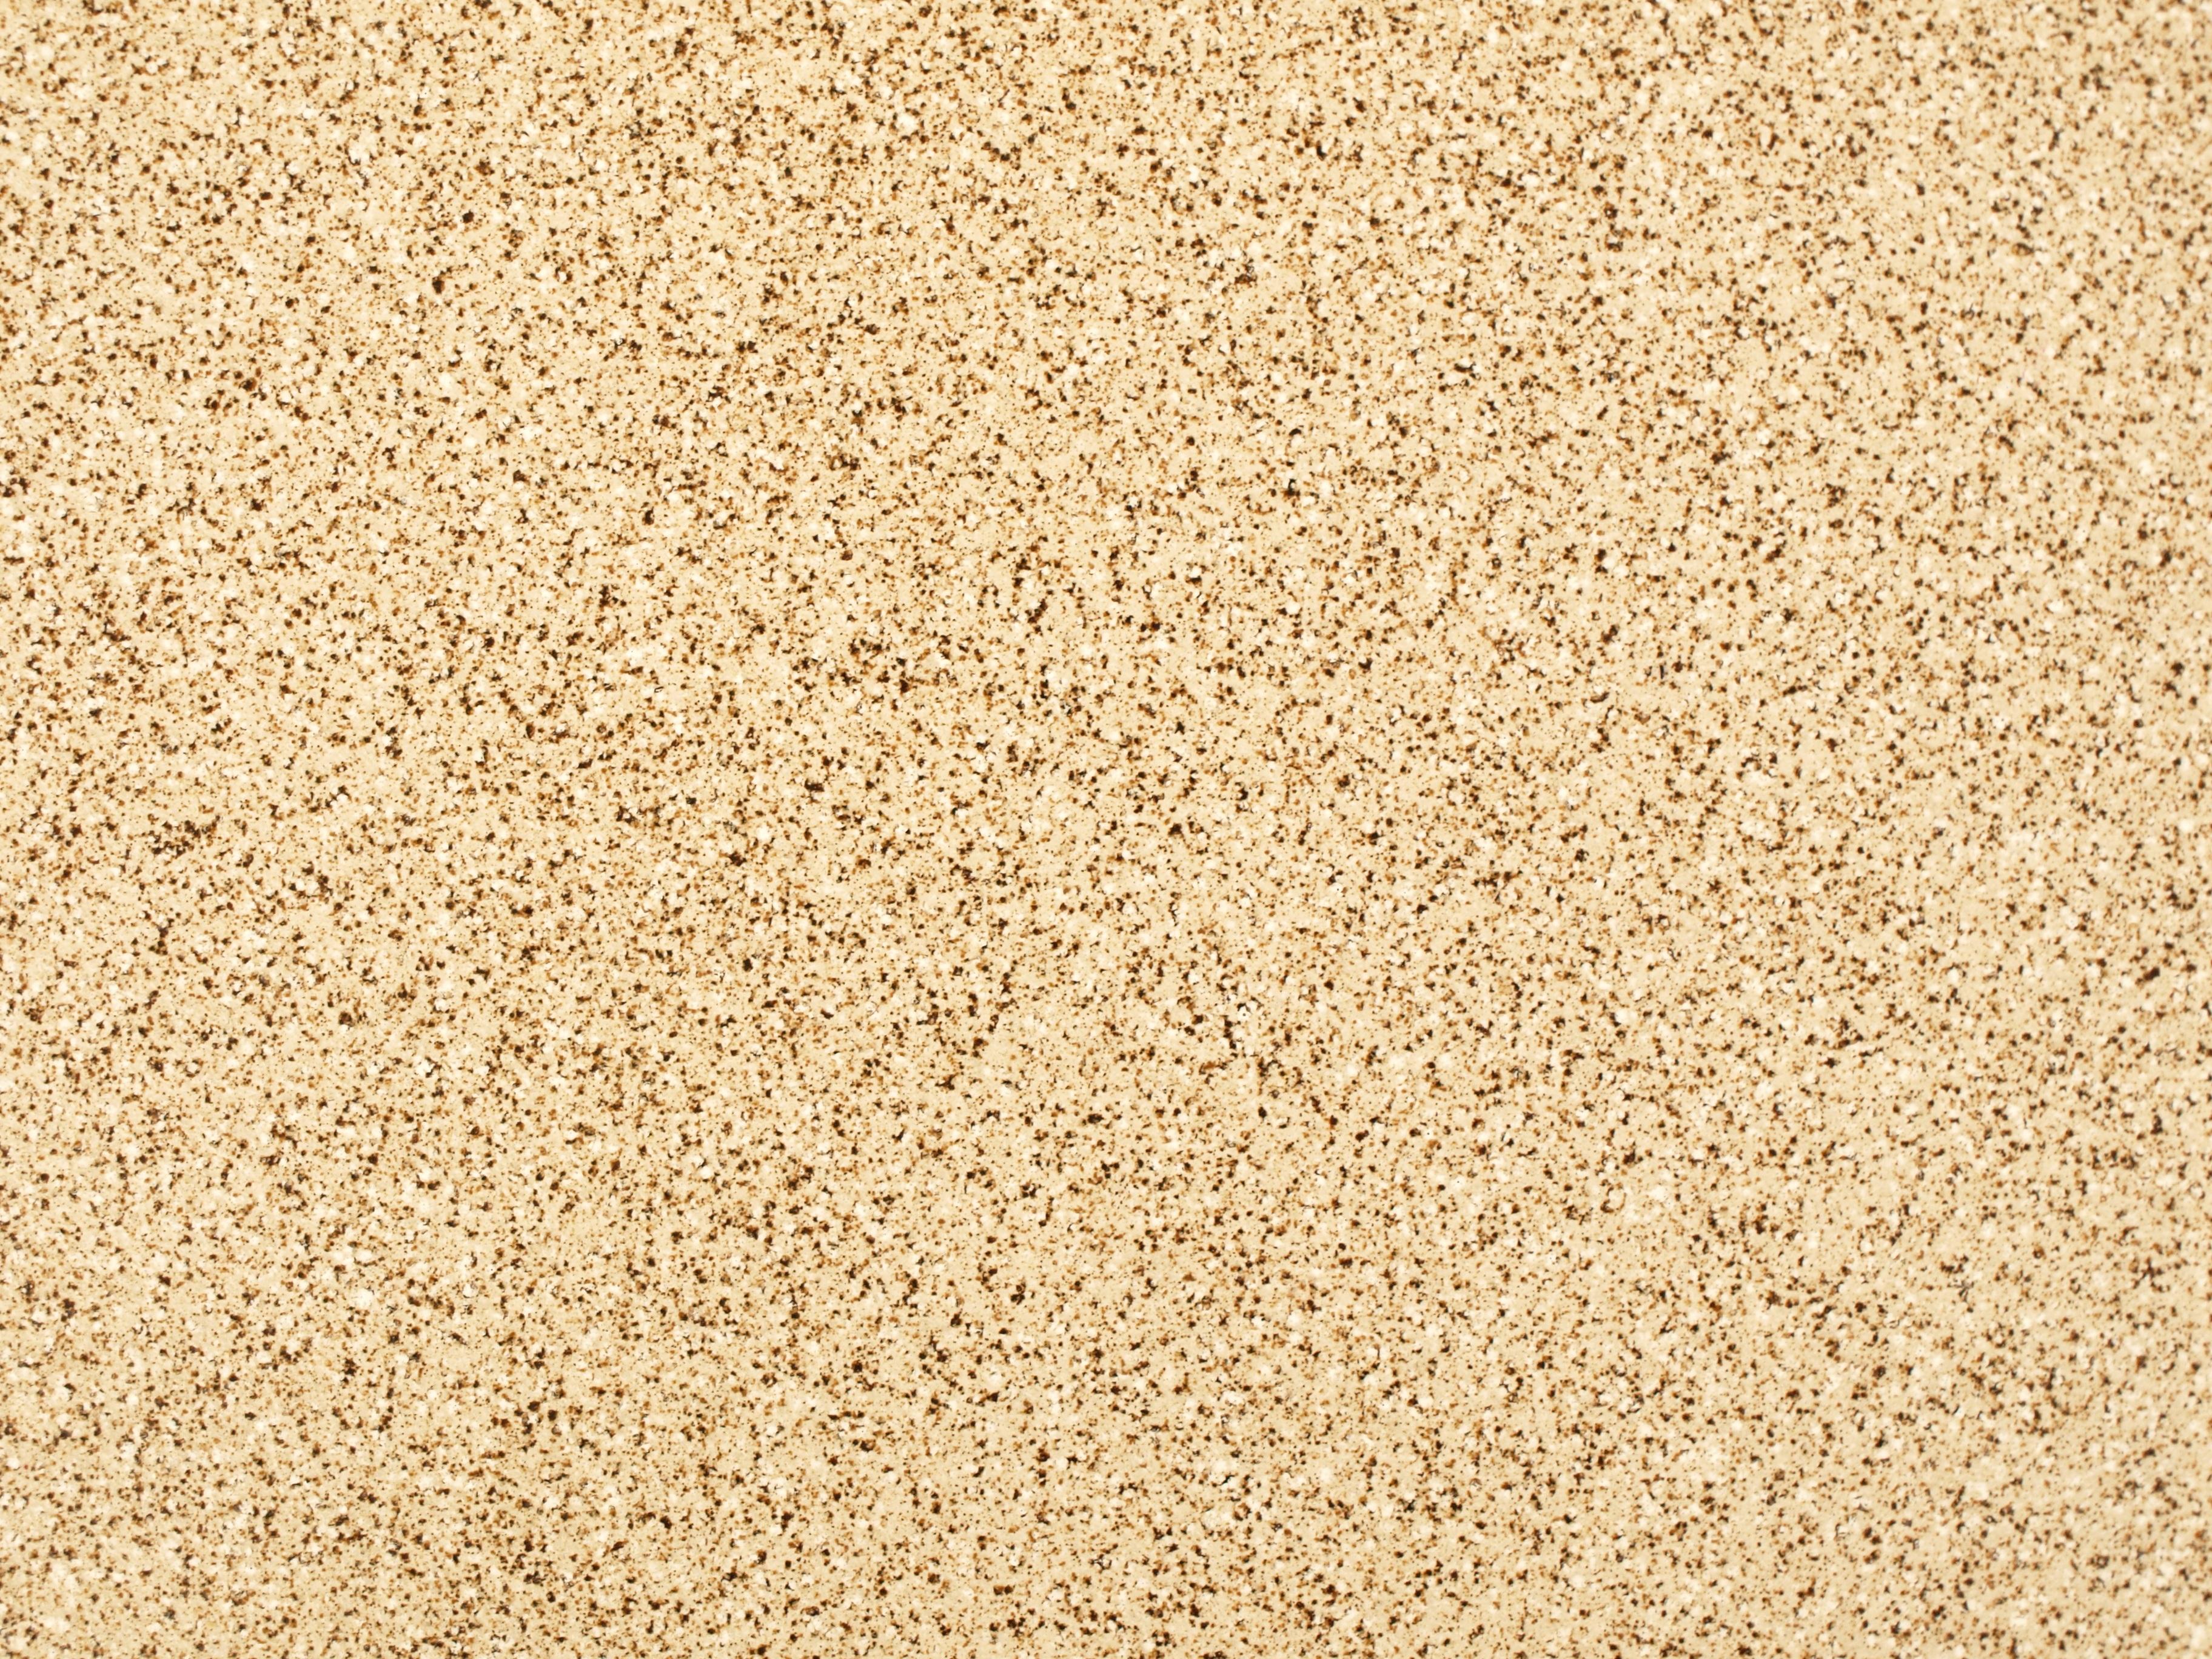 Sand Wood Texture Floor Stone Model Soil Material Gravel Granite Textures Grains The Background Marbled Flooring